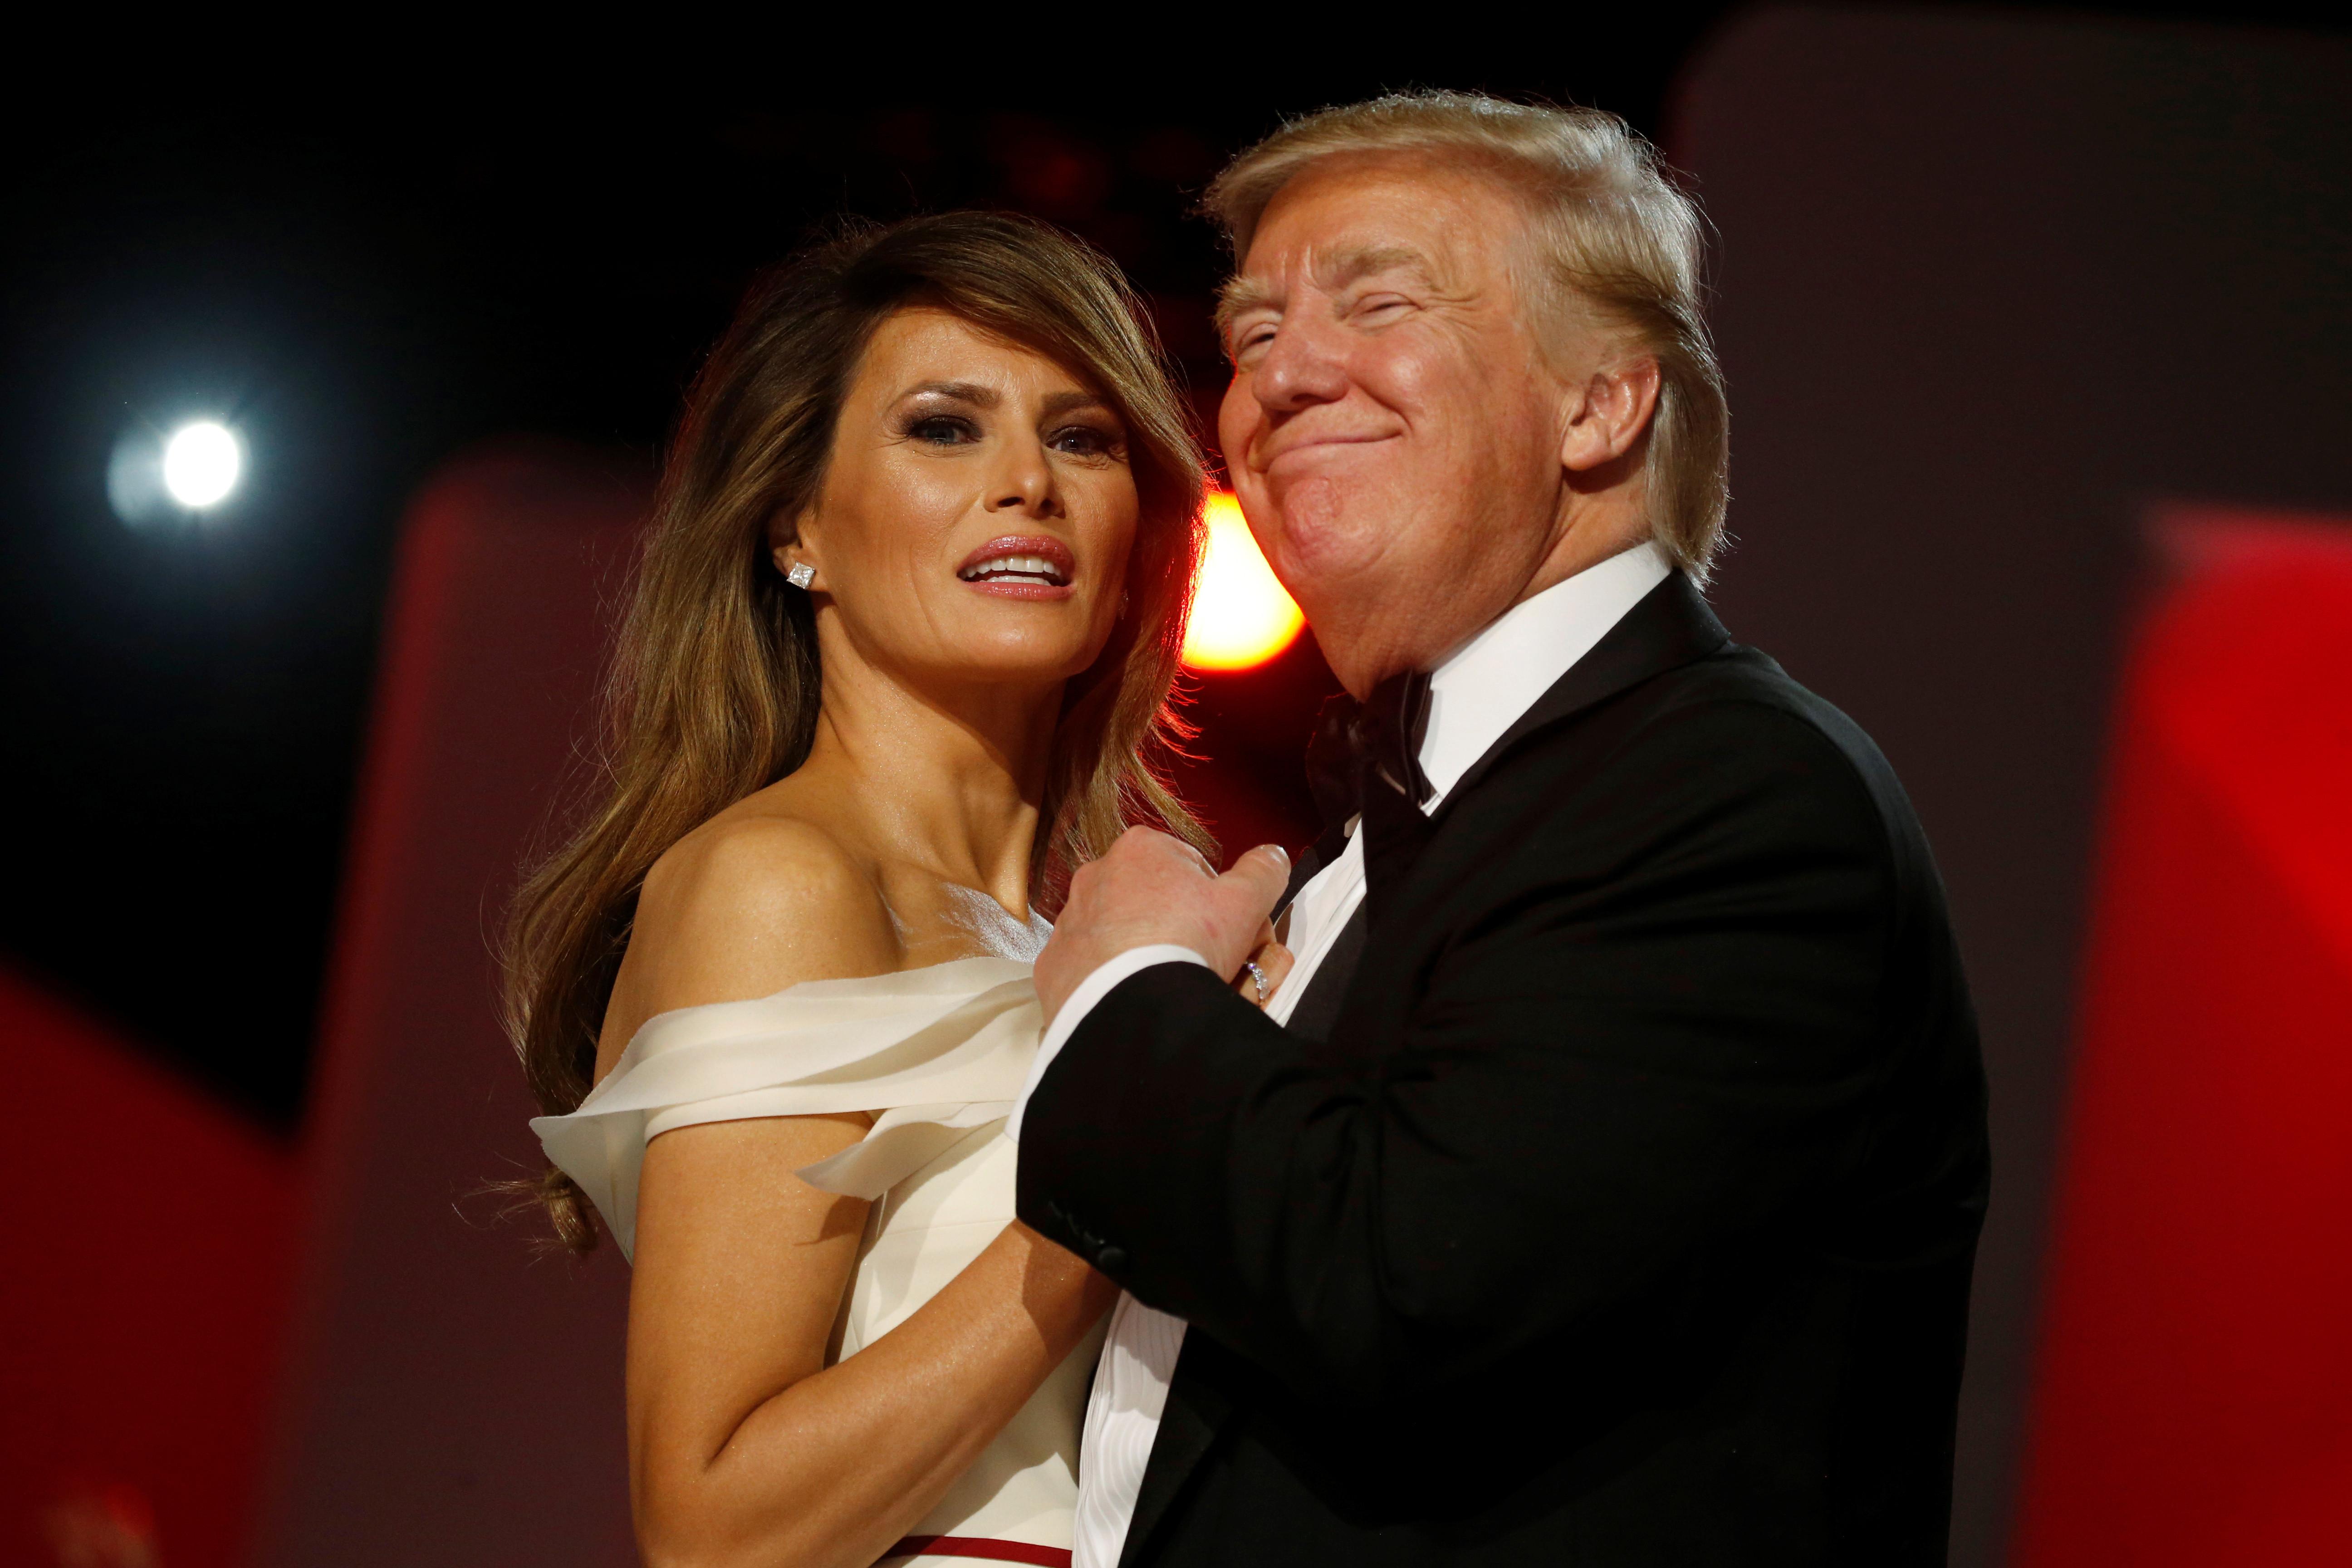 What Is Melania Trump Doing?